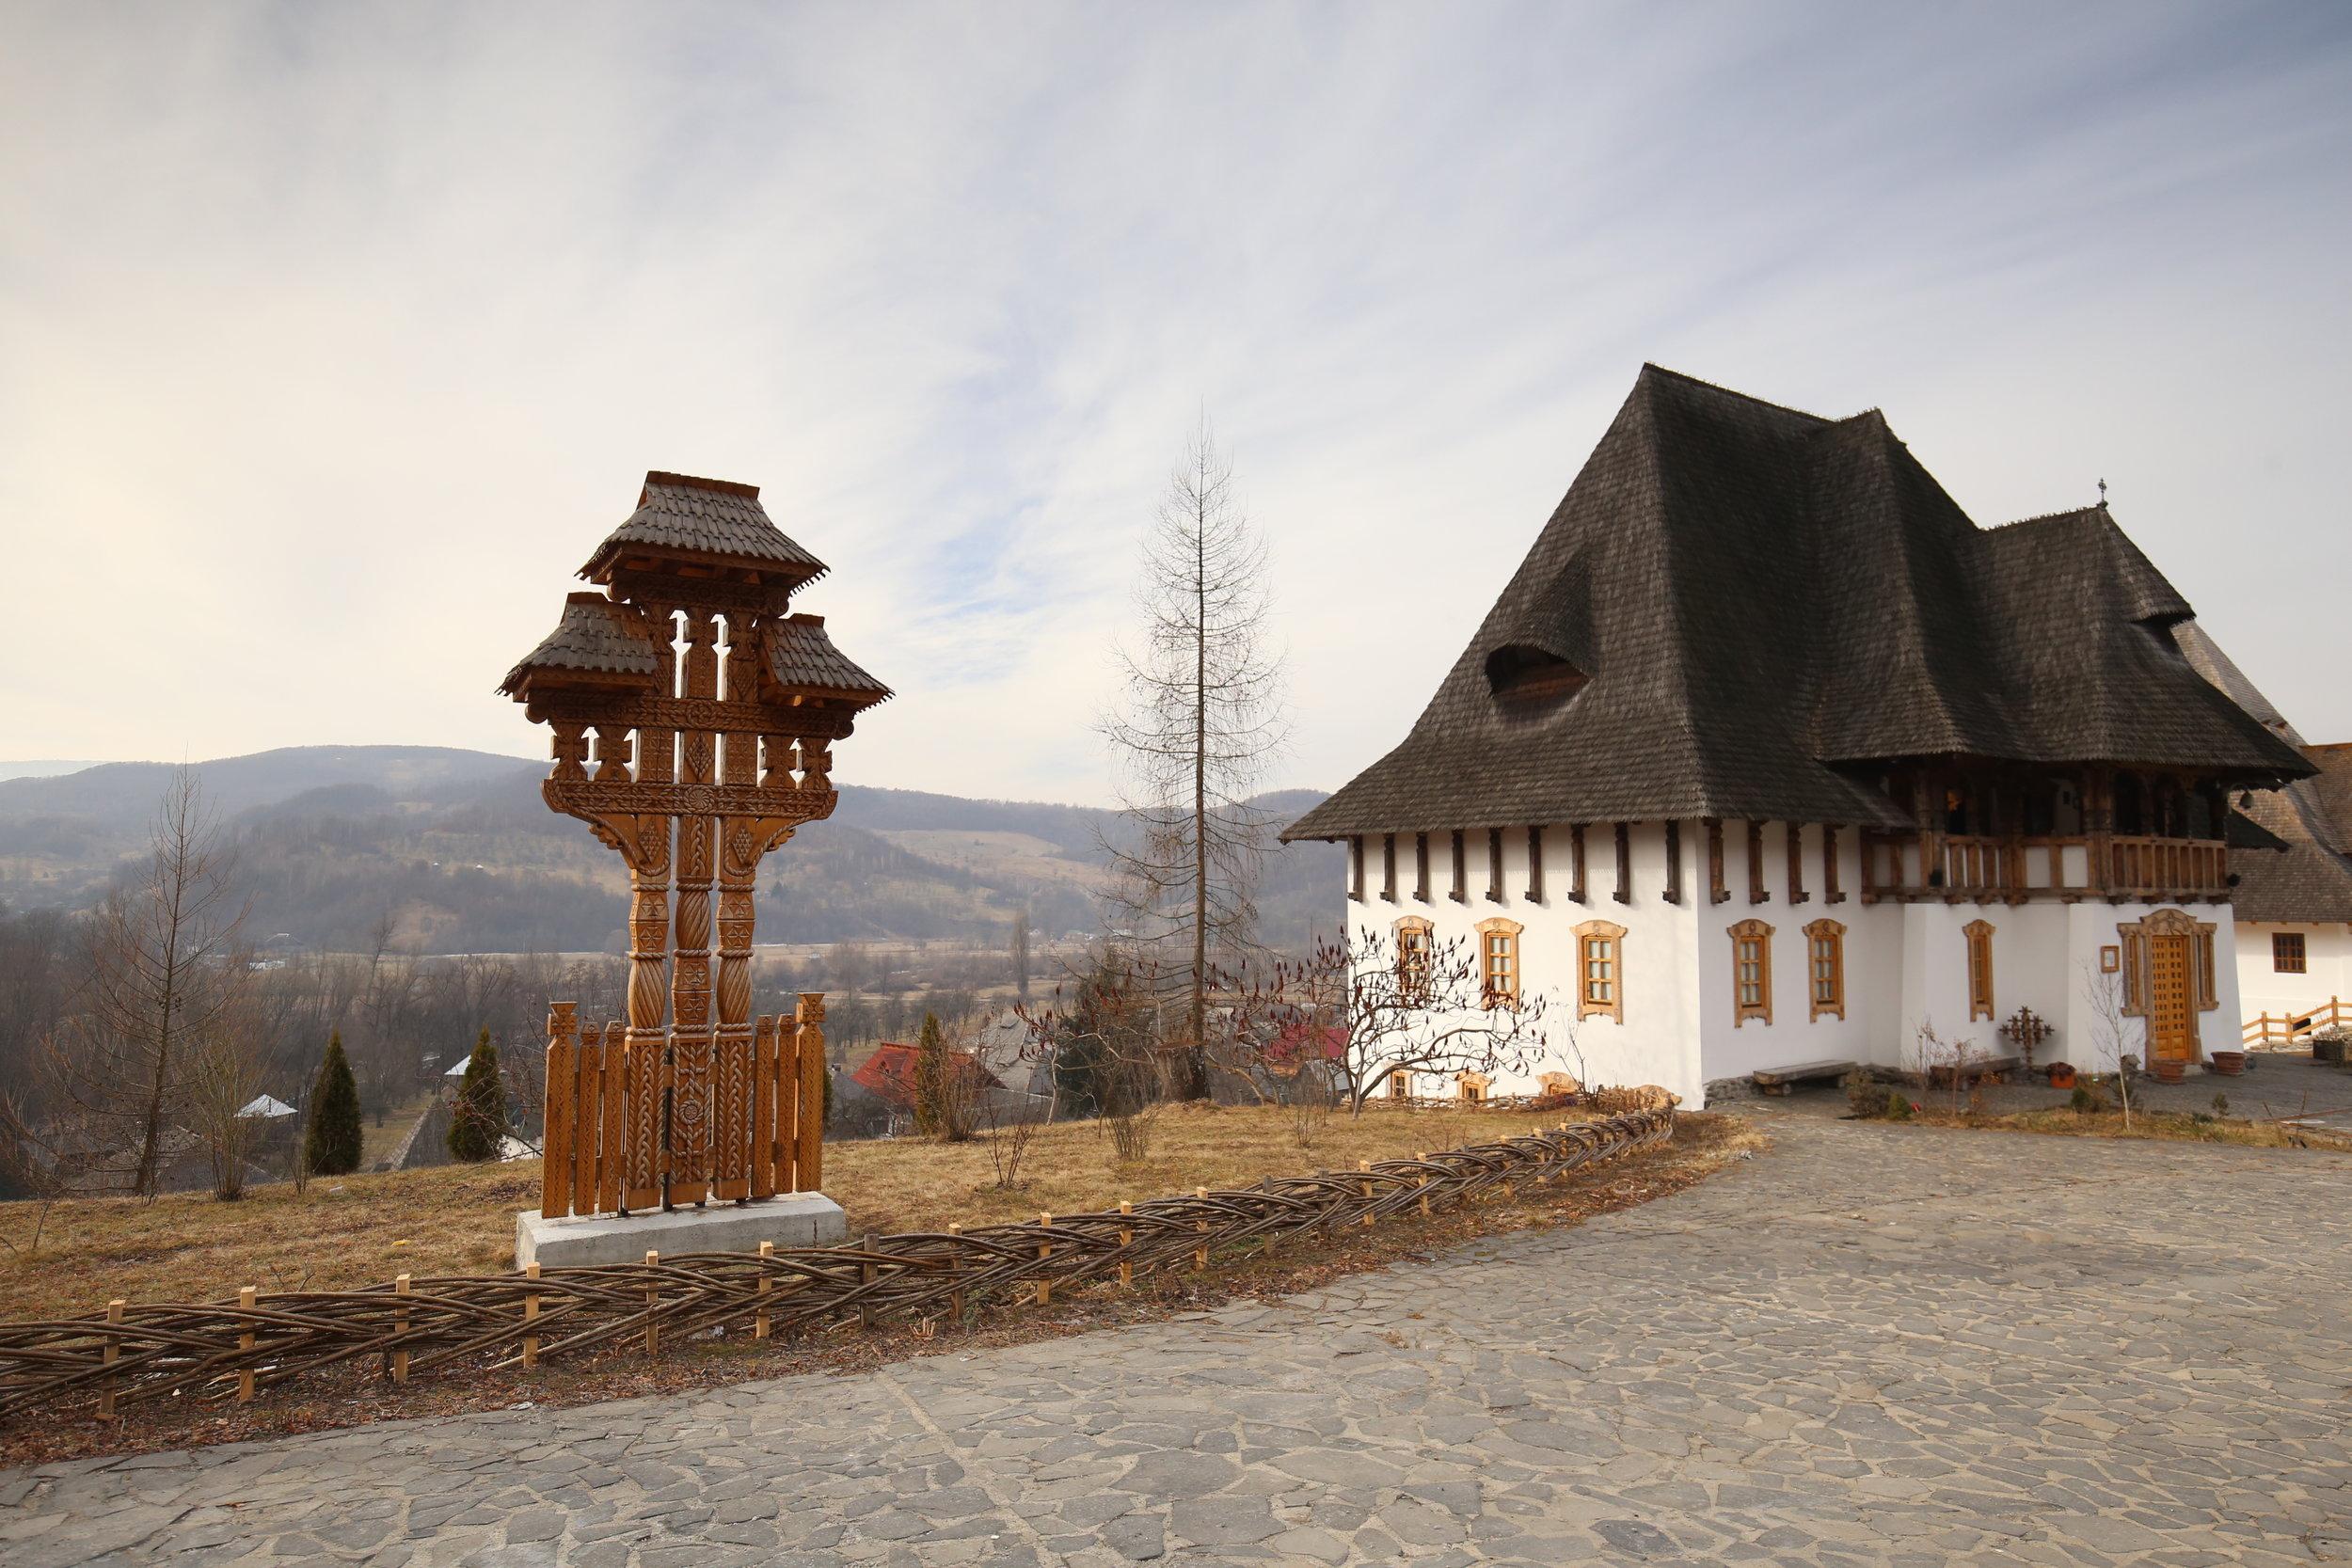 The beautiful wooden architecture of Bârsana Monastery, Romania.